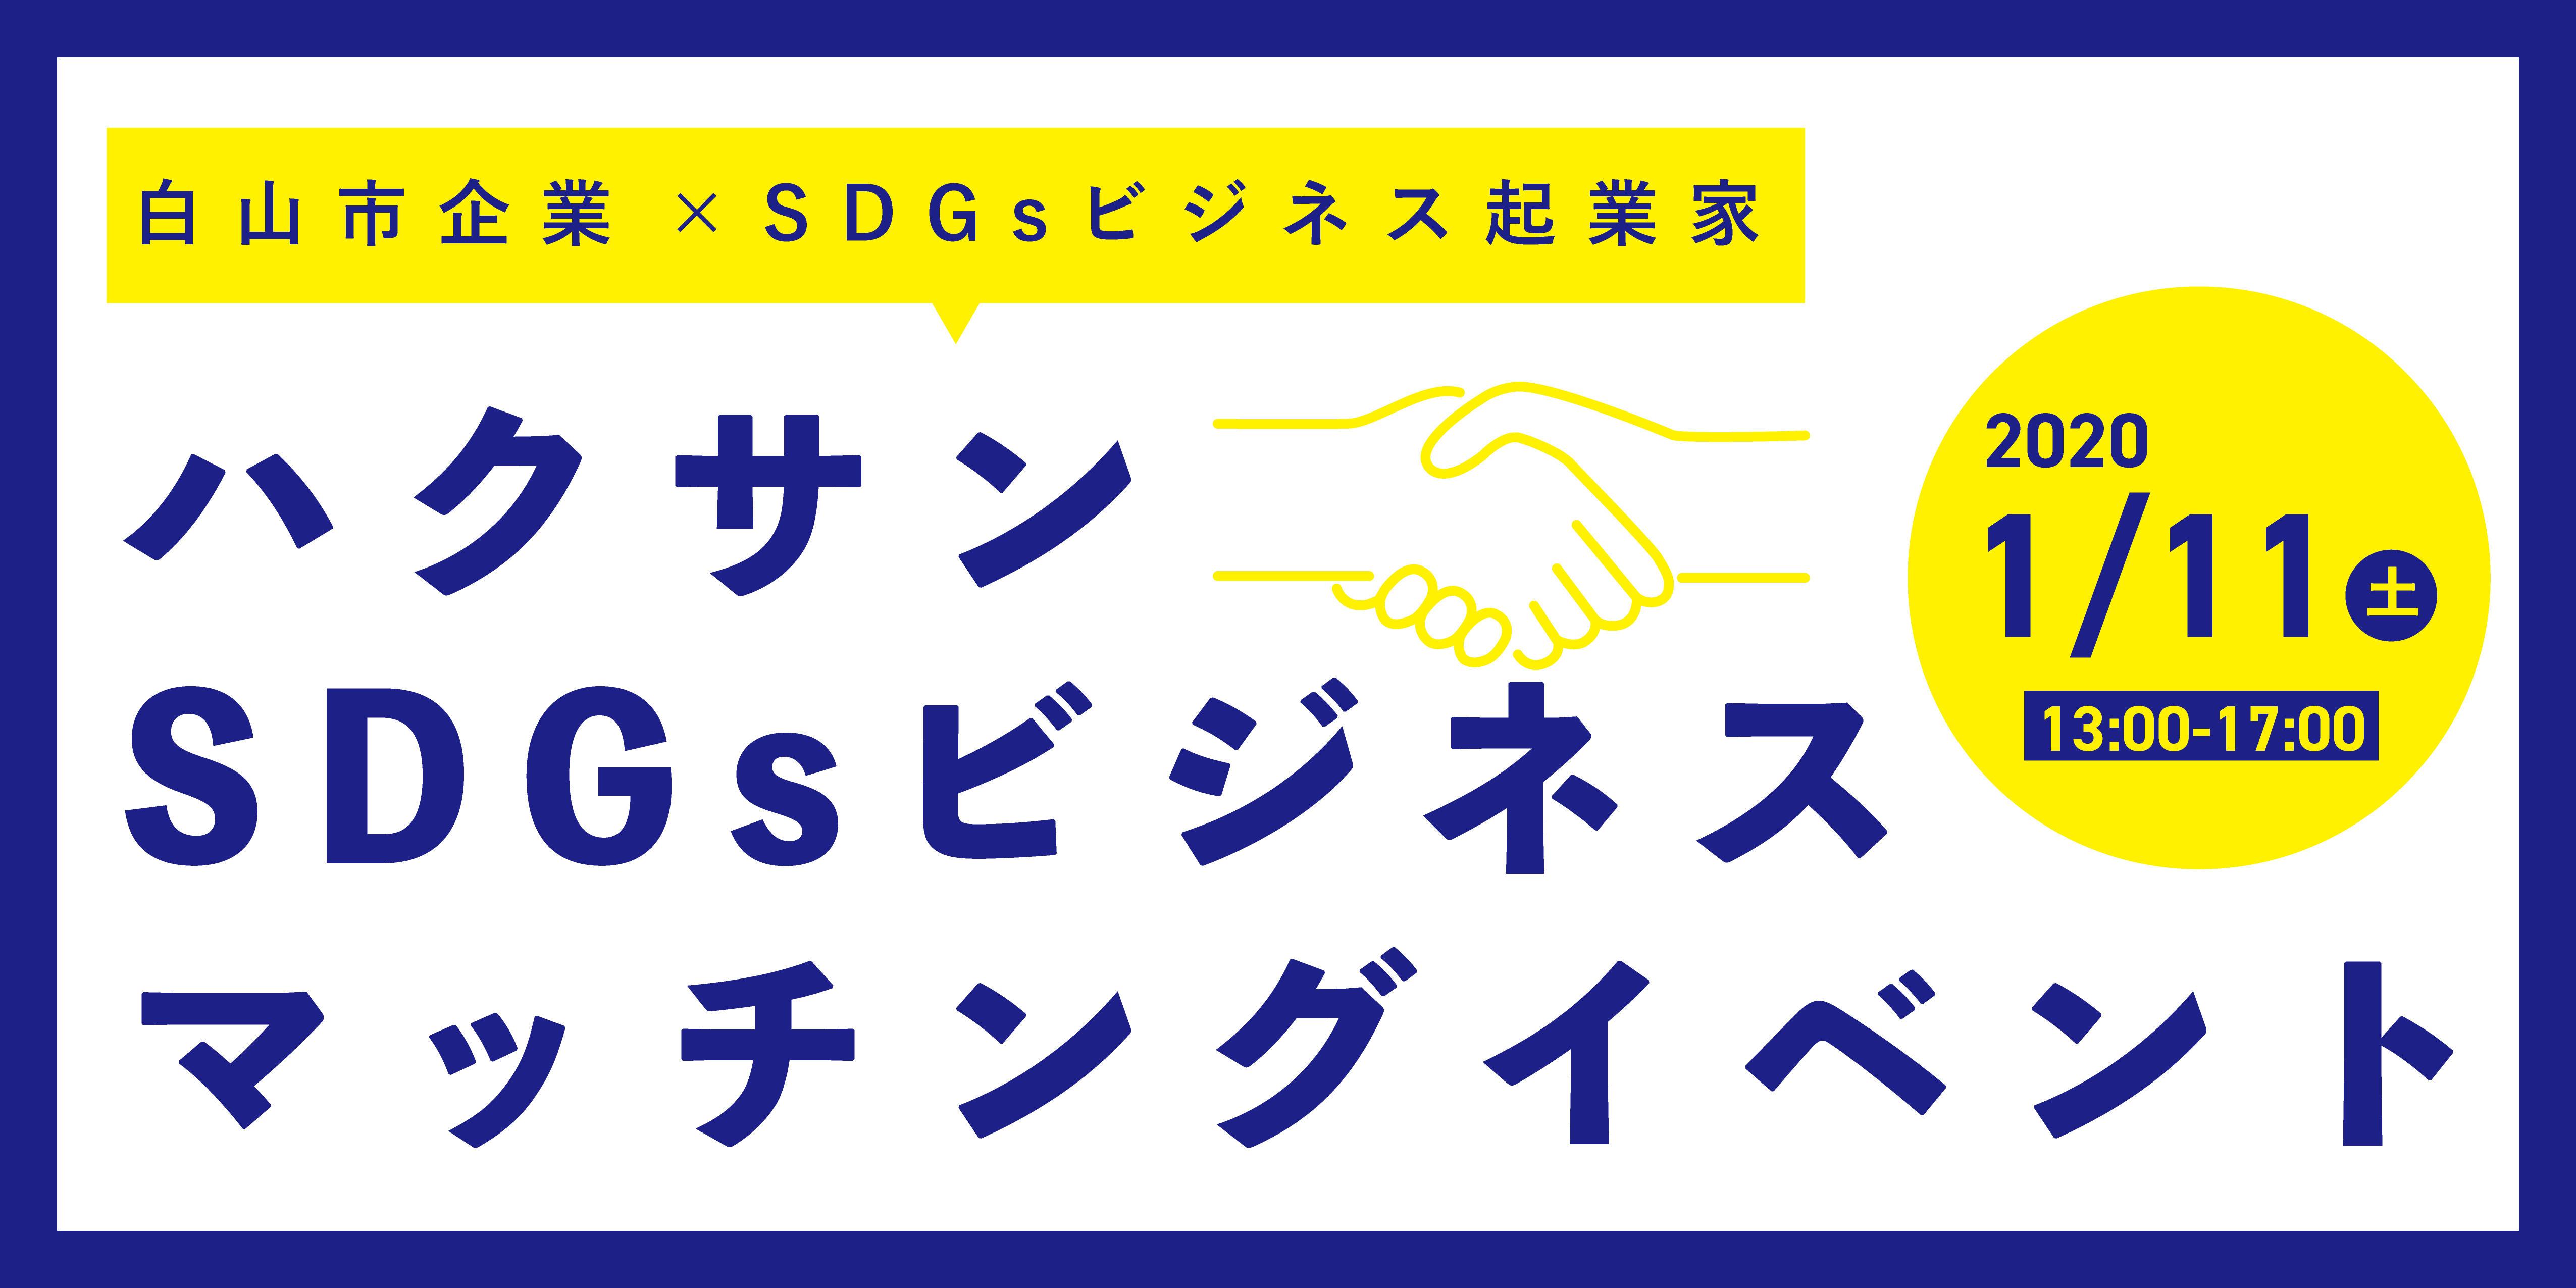 SDGs新規事業の開拓や取引機会の創出を目指して「全国のSDGsビジネス起業家」と「SDGsに注目する白山市の企業」をマッチング。「ハクサンSDGsビジネスマッチングイベント」開催 -- 金沢工業大学